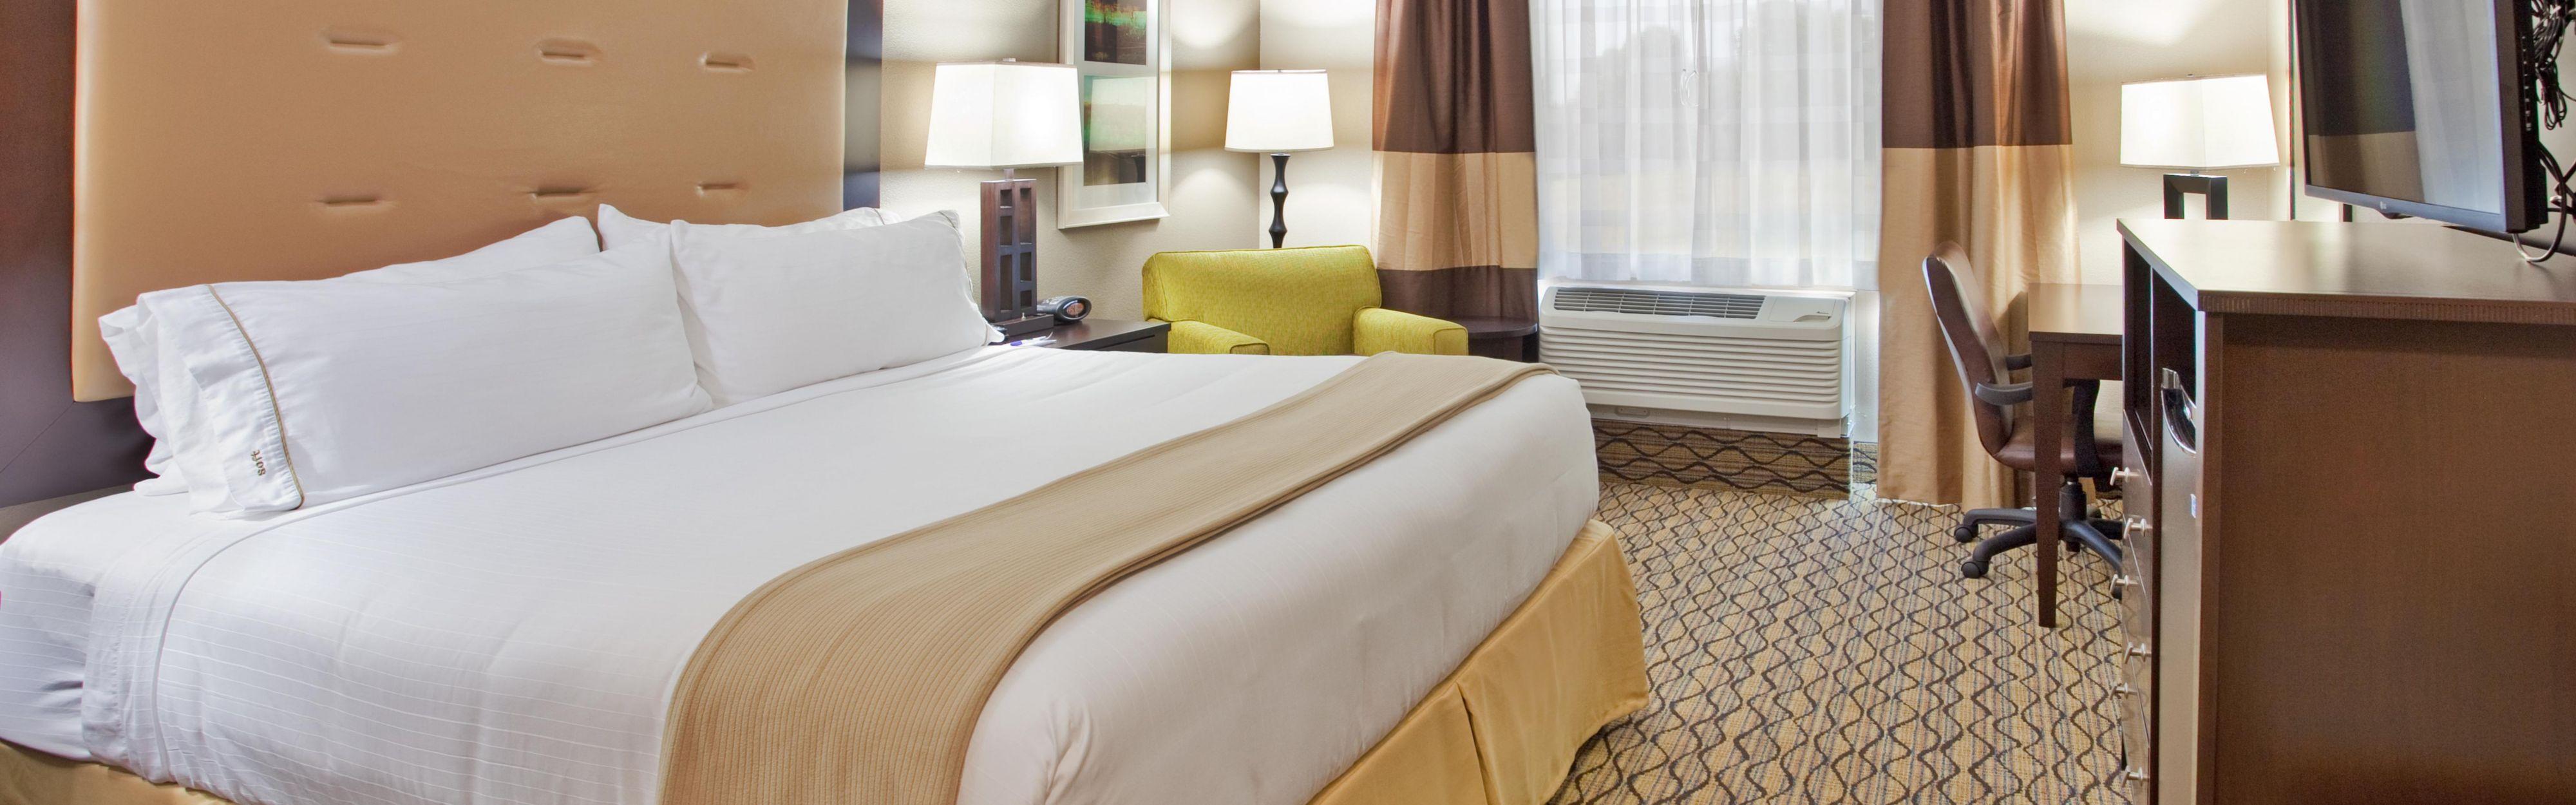 Holiday Inn Express & Suites St. Joseph image 1